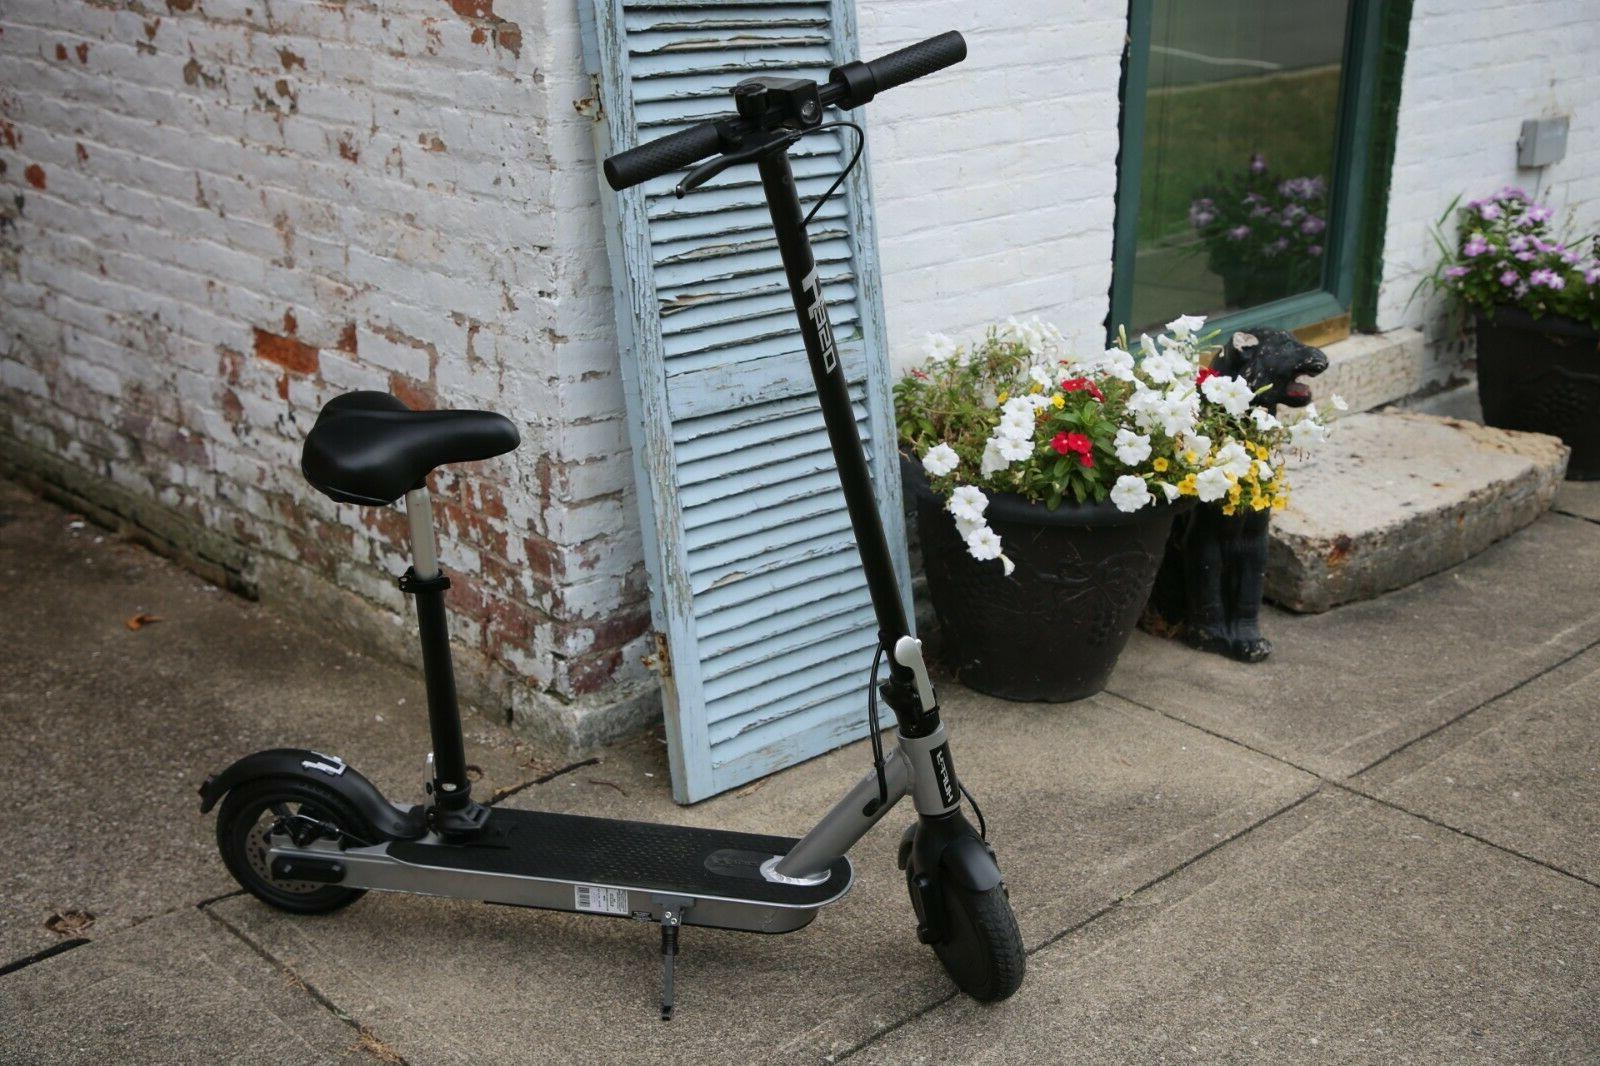 Huffy Folding Scooter - - Seat, Kickstand, Bell